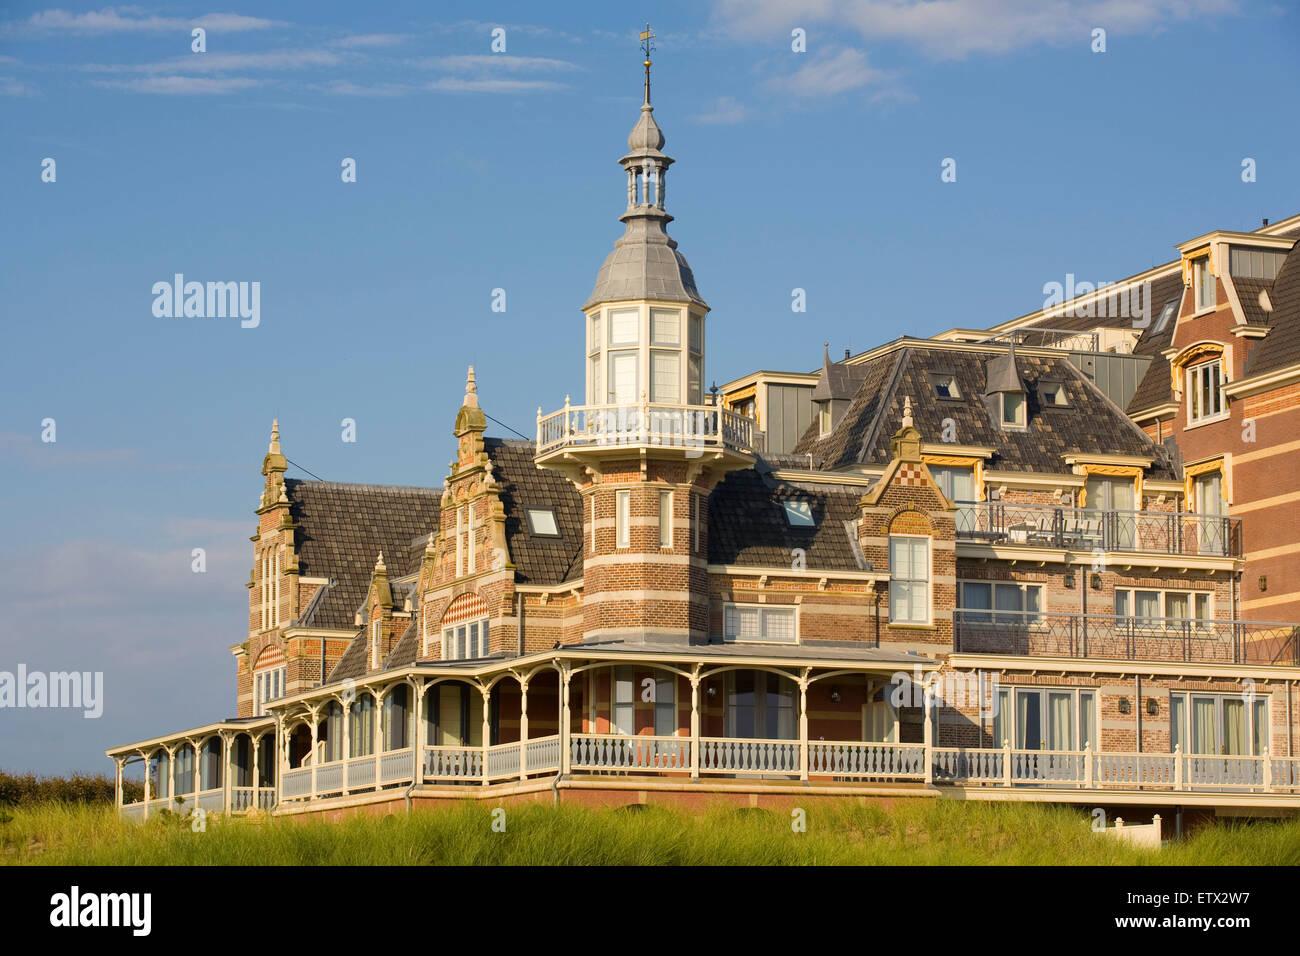 Europe, Netherlands, Zeeland, Domburg on the island Walcheren, the Badpaviljoen [In former days this building served - Stock Image